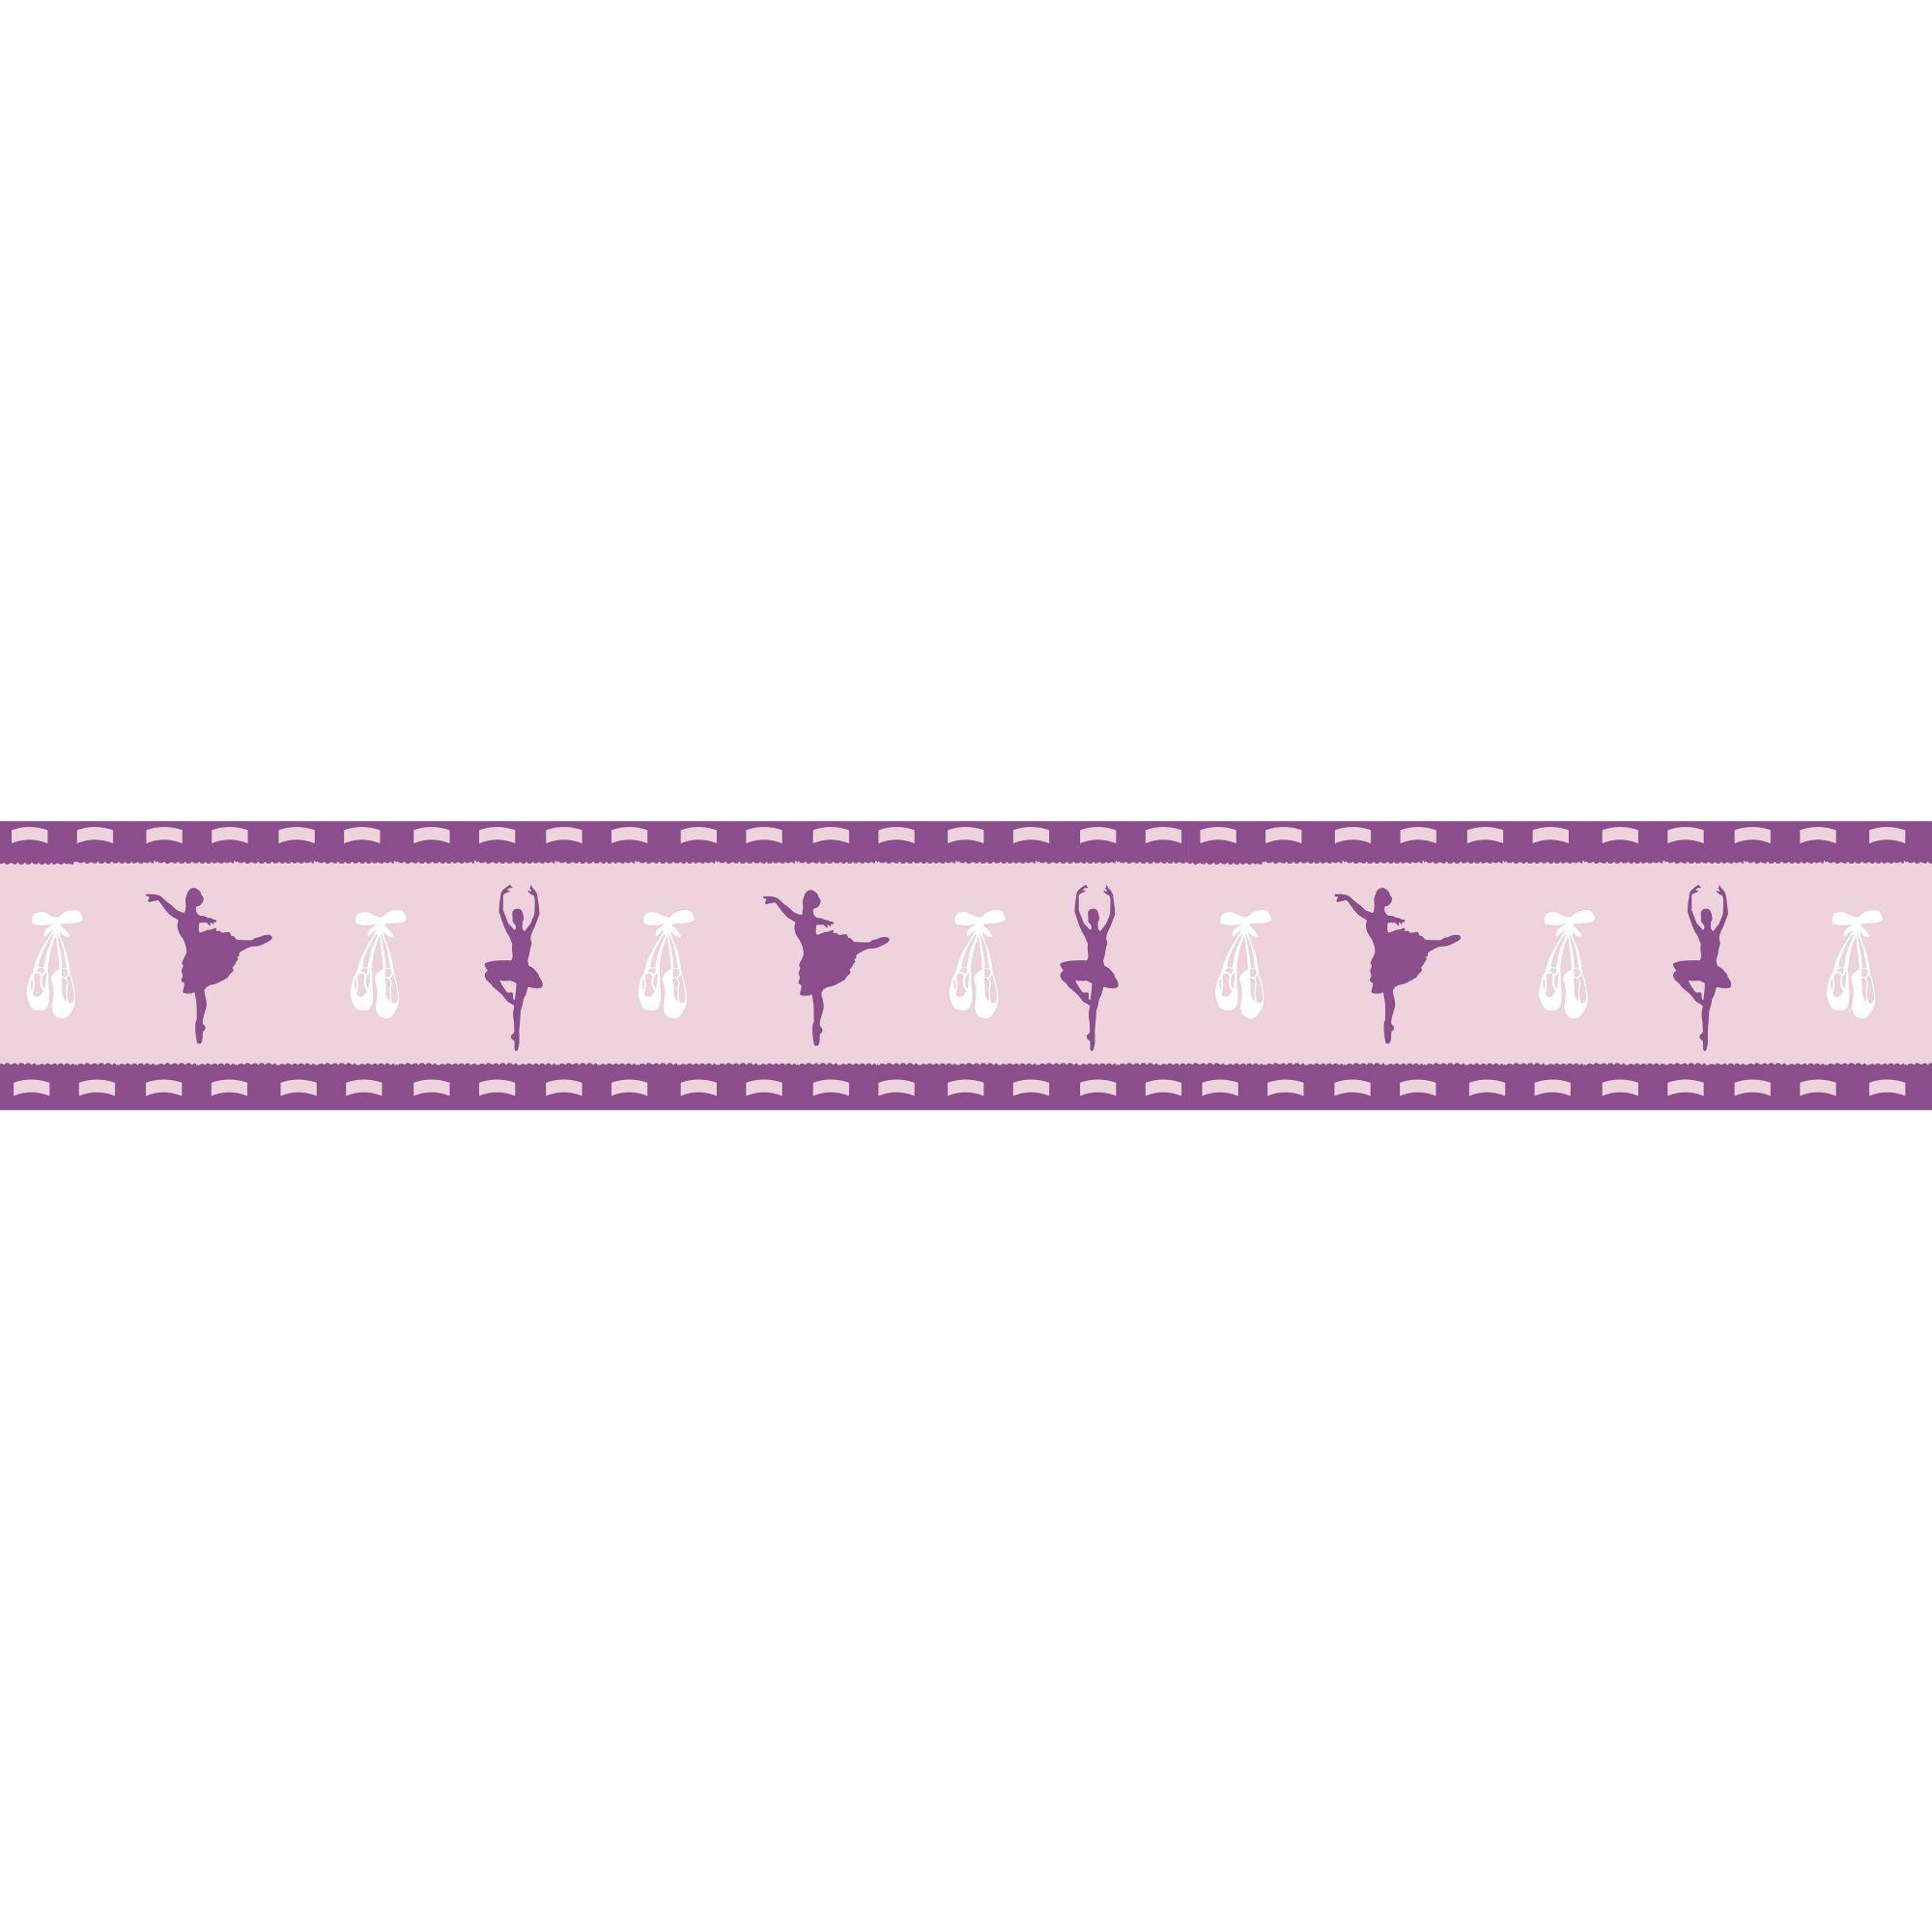 Faixa Decorativa Adesiva Bailarinas Violeta  - Final Decor